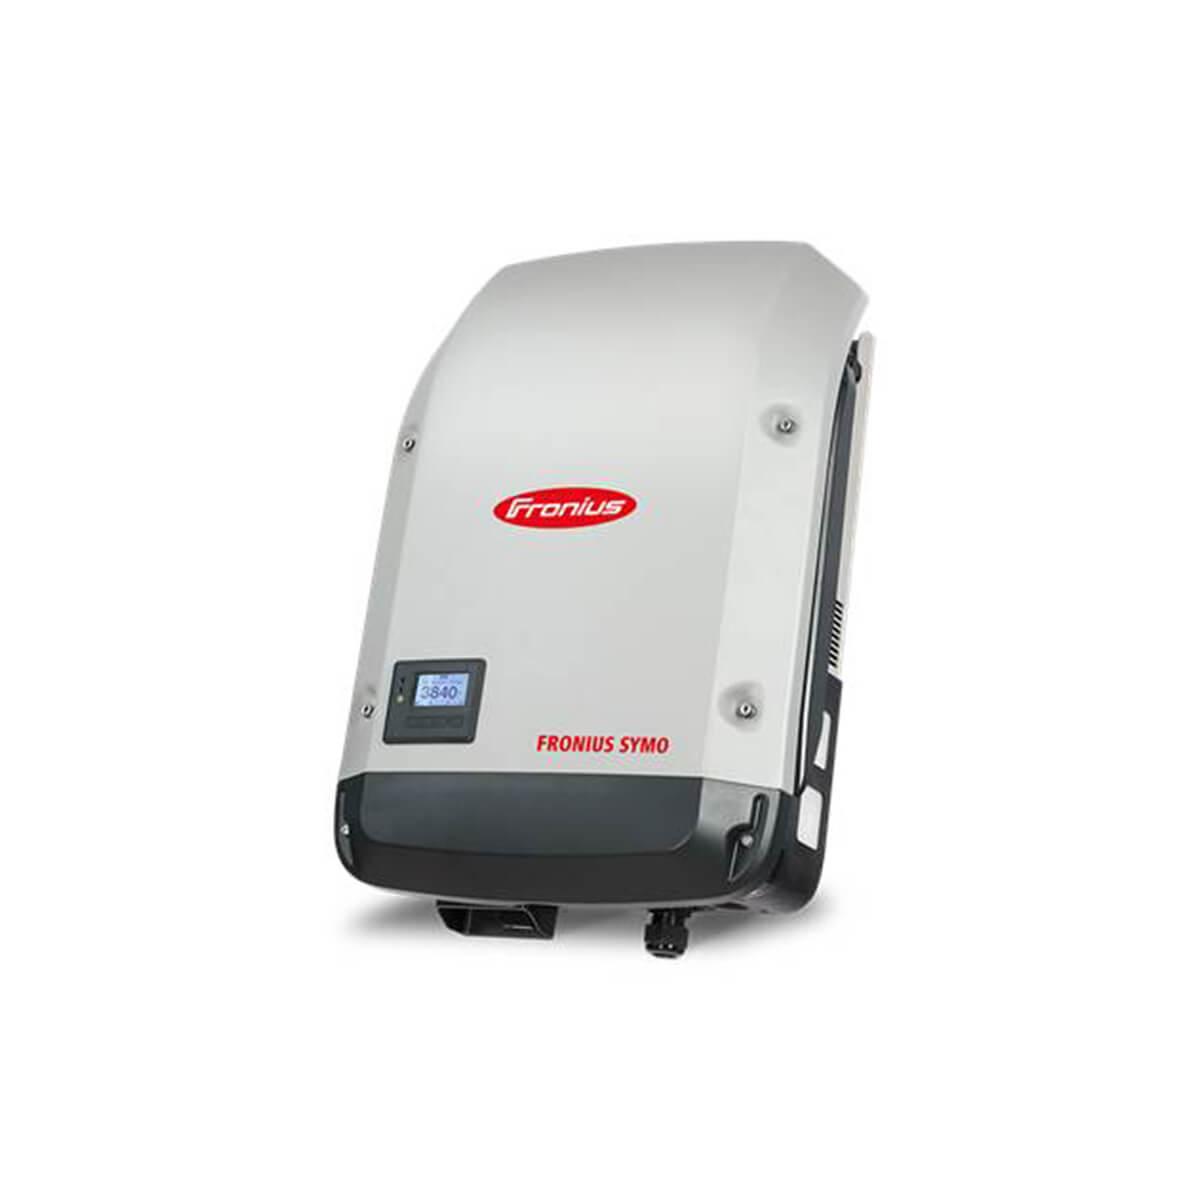 fronius 20kW inverter, fronius symo 20kW inverter, fronius symo 20.0-3-m inverter, fronius symo 20.0-3-m, fronius symo 20 kW, FRONIUS 20 KW